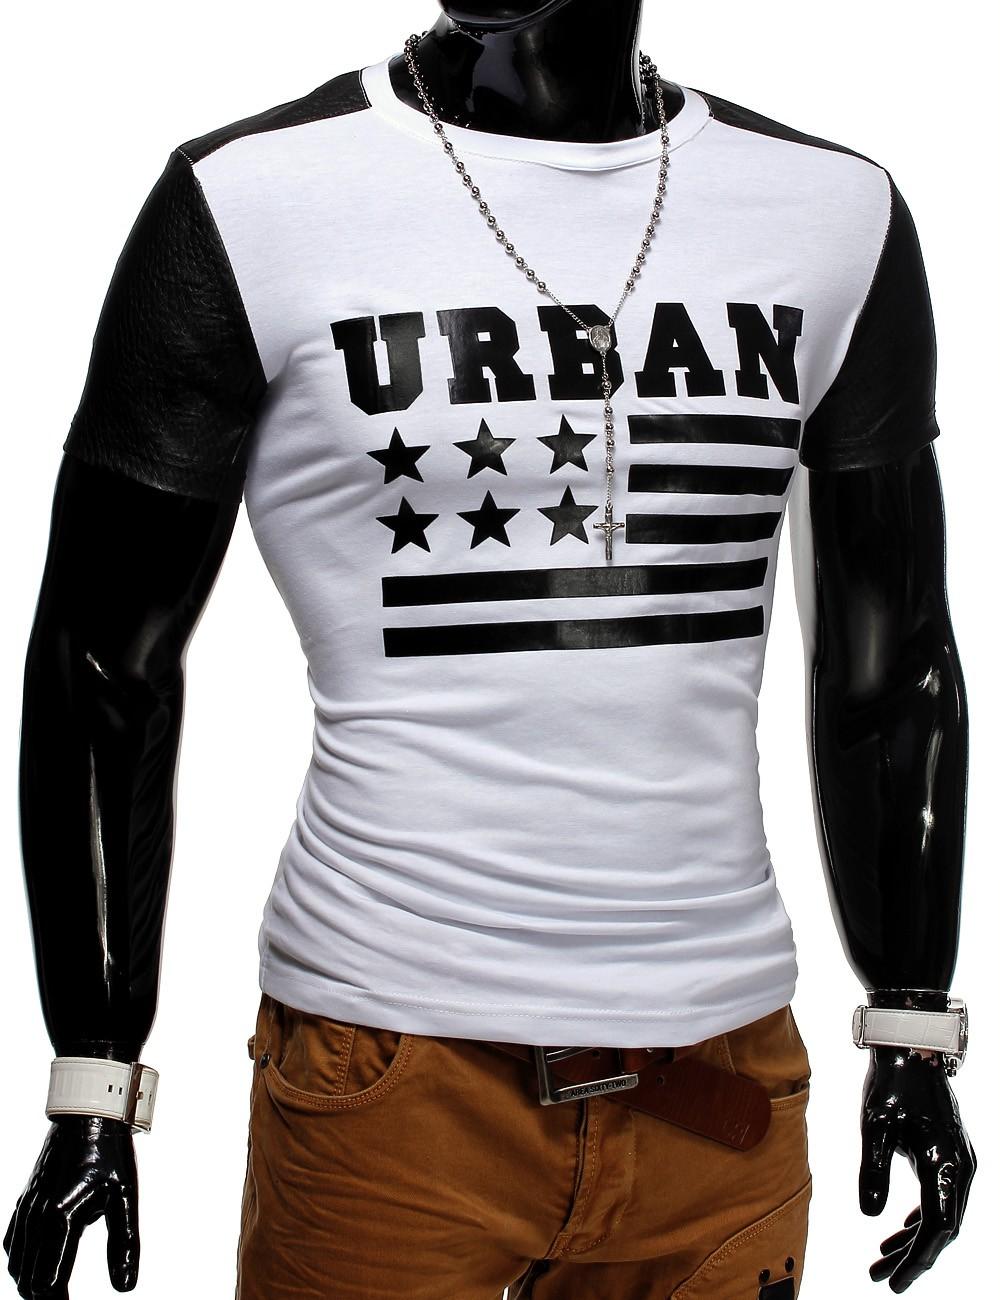 herren t shirt unisex polo sterne clubwear urban usa nation flag ebay. Black Bedroom Furniture Sets. Home Design Ideas